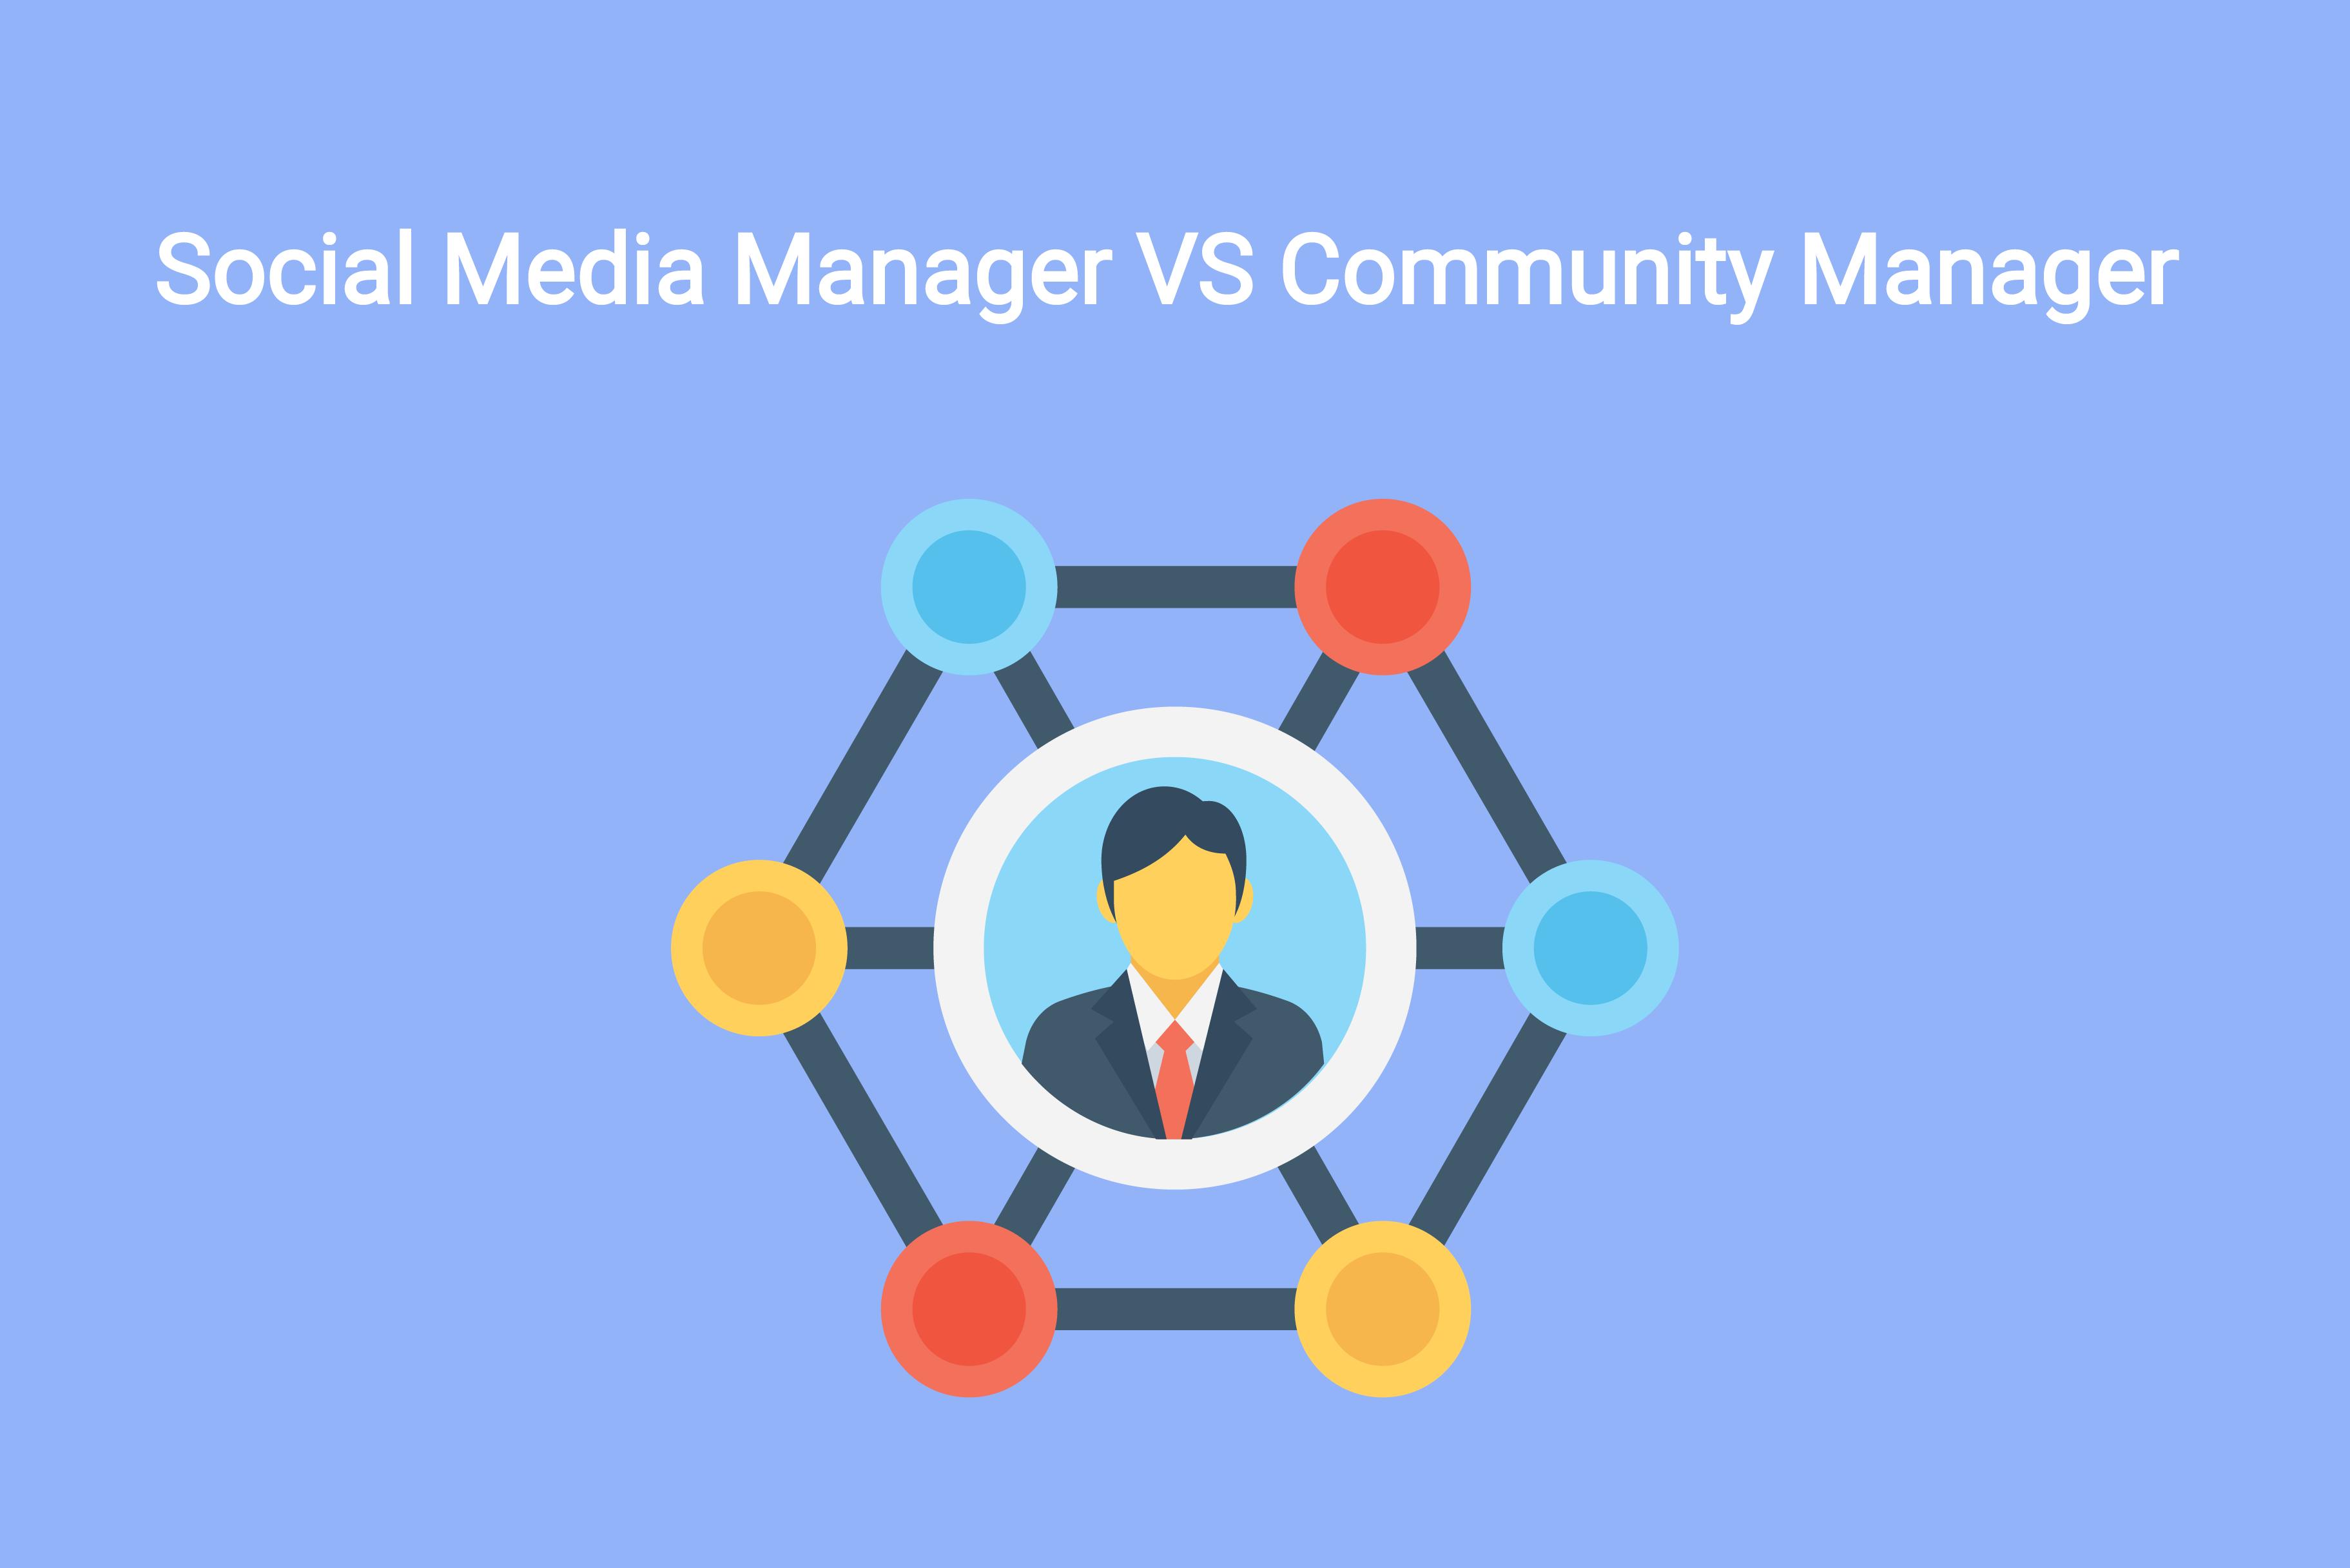 Social Media Manager vs Community Manager